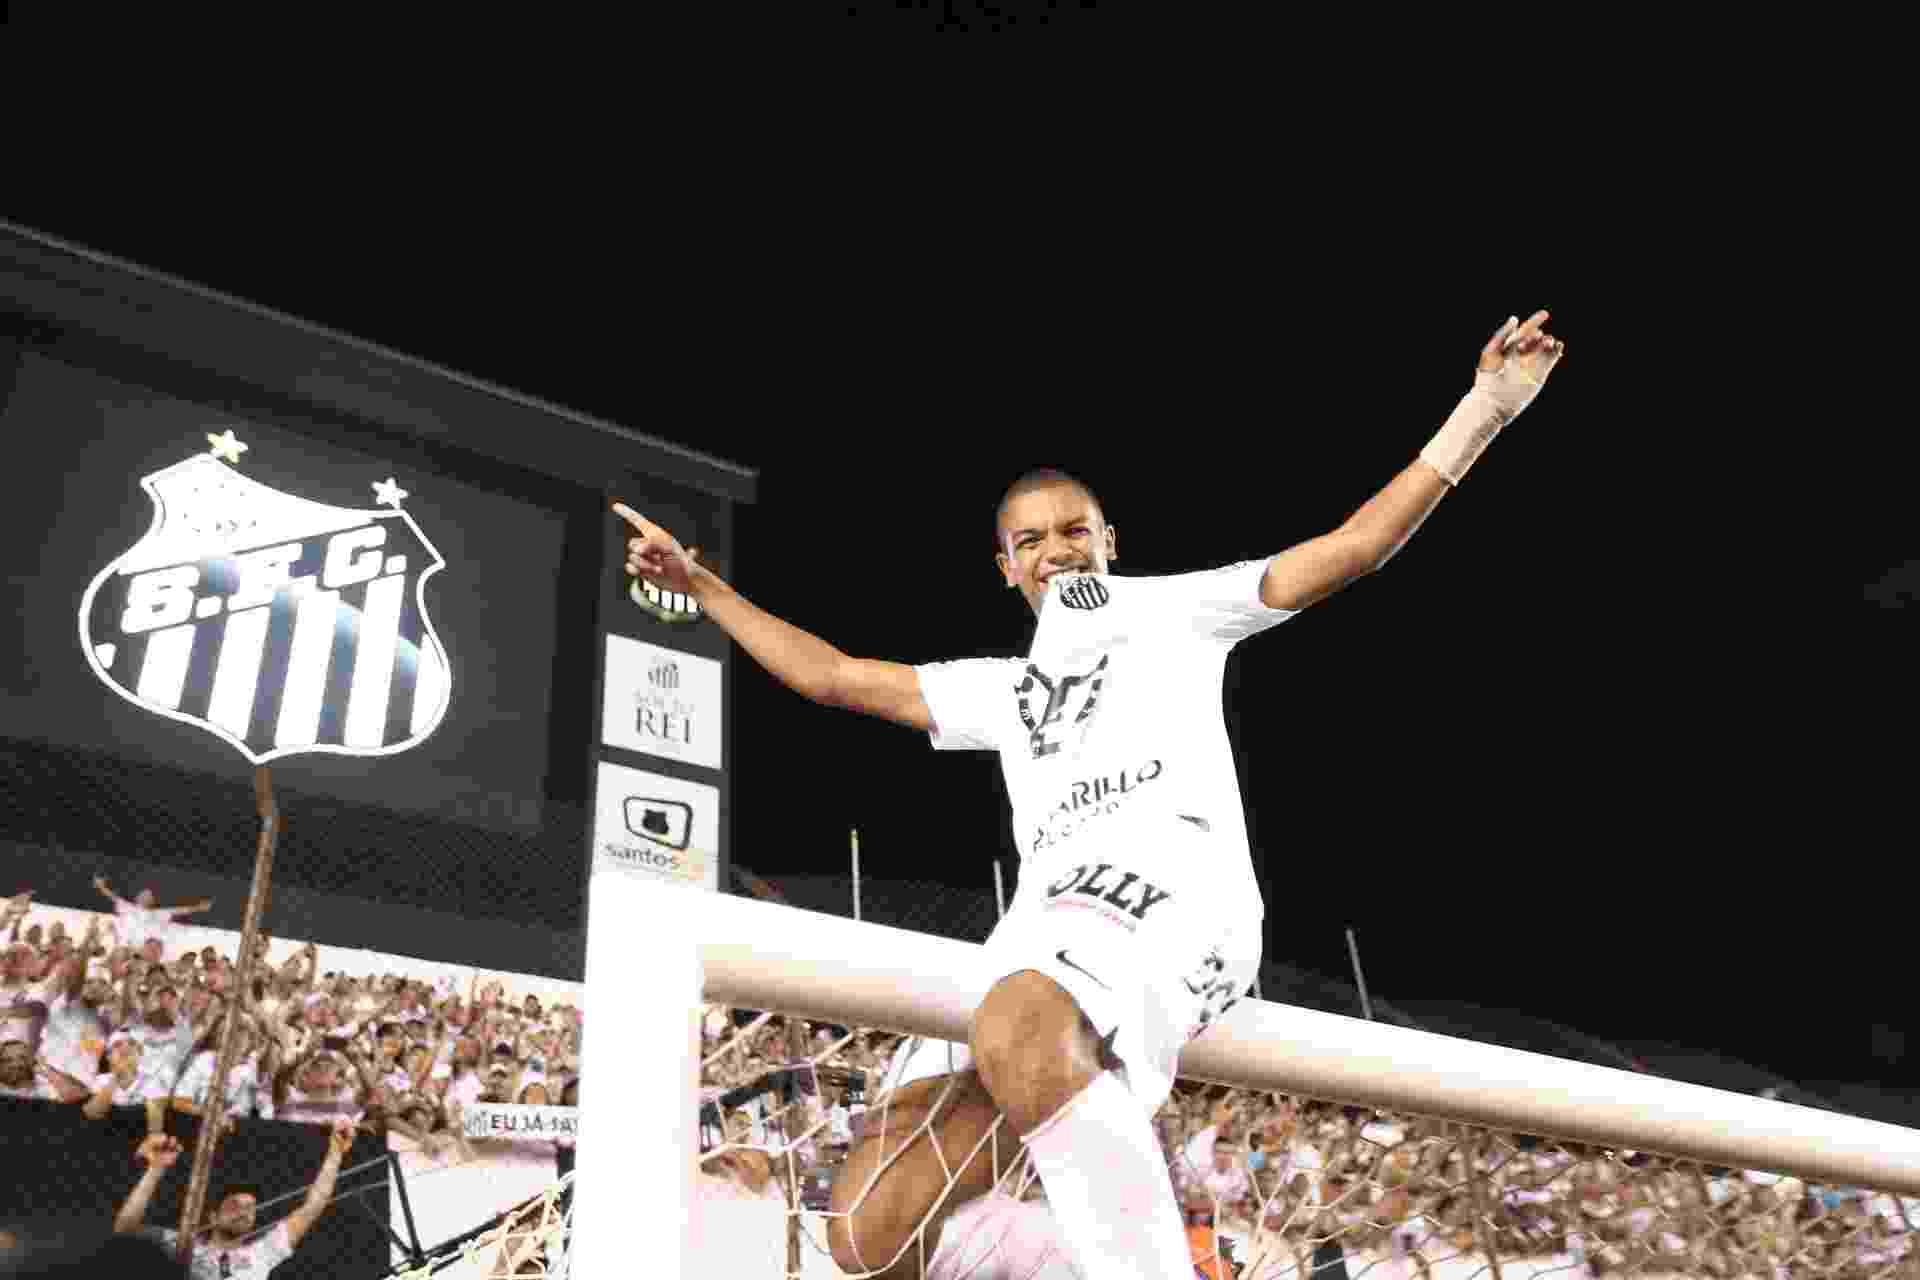 David Braz sobe na trave da Vila Belmiro para comemorar o título de campeão Paulista - Danilo Verpa/Folhapress